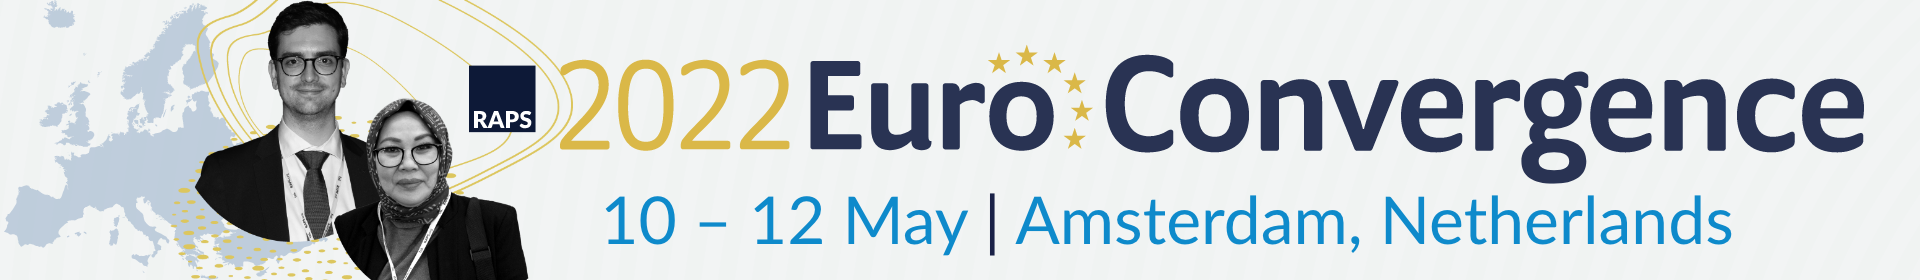 RAPS Euro Convergence 2022 Event Banner